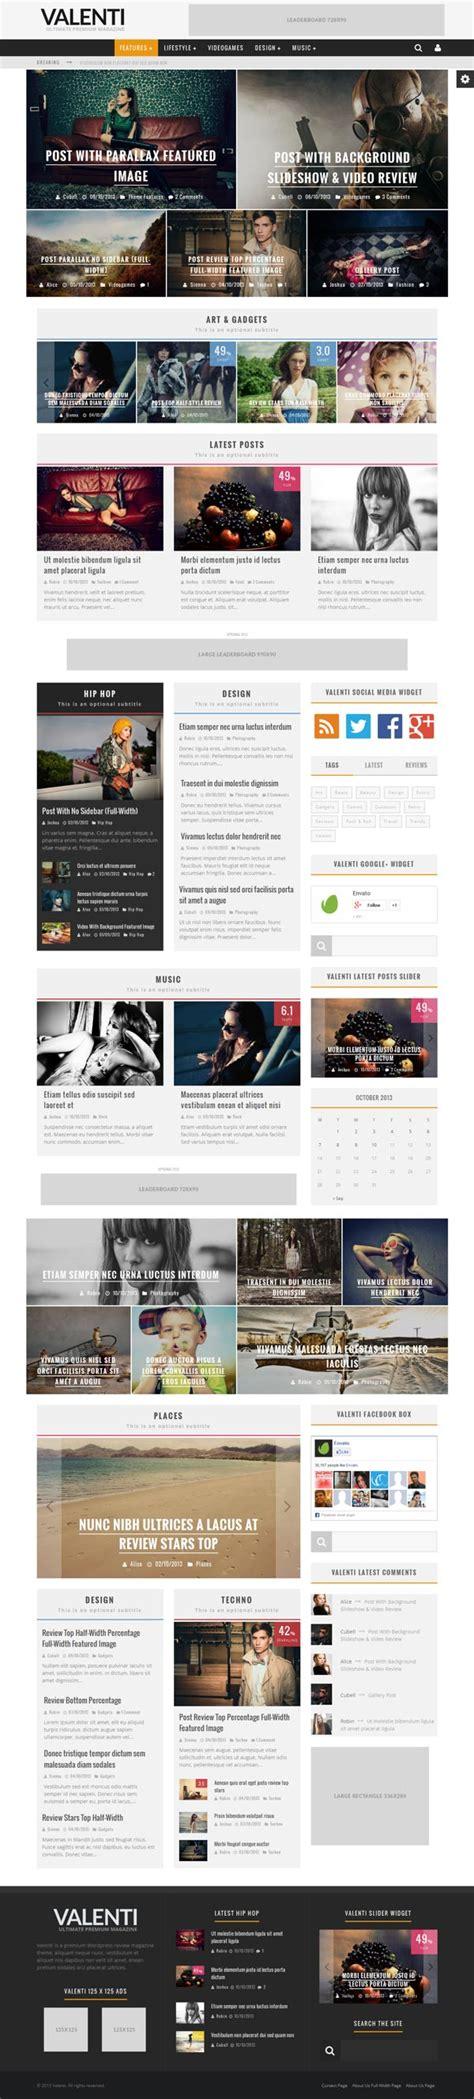 theme wordpress valenti valenti wordpress hd blog and magazine theme by cubell